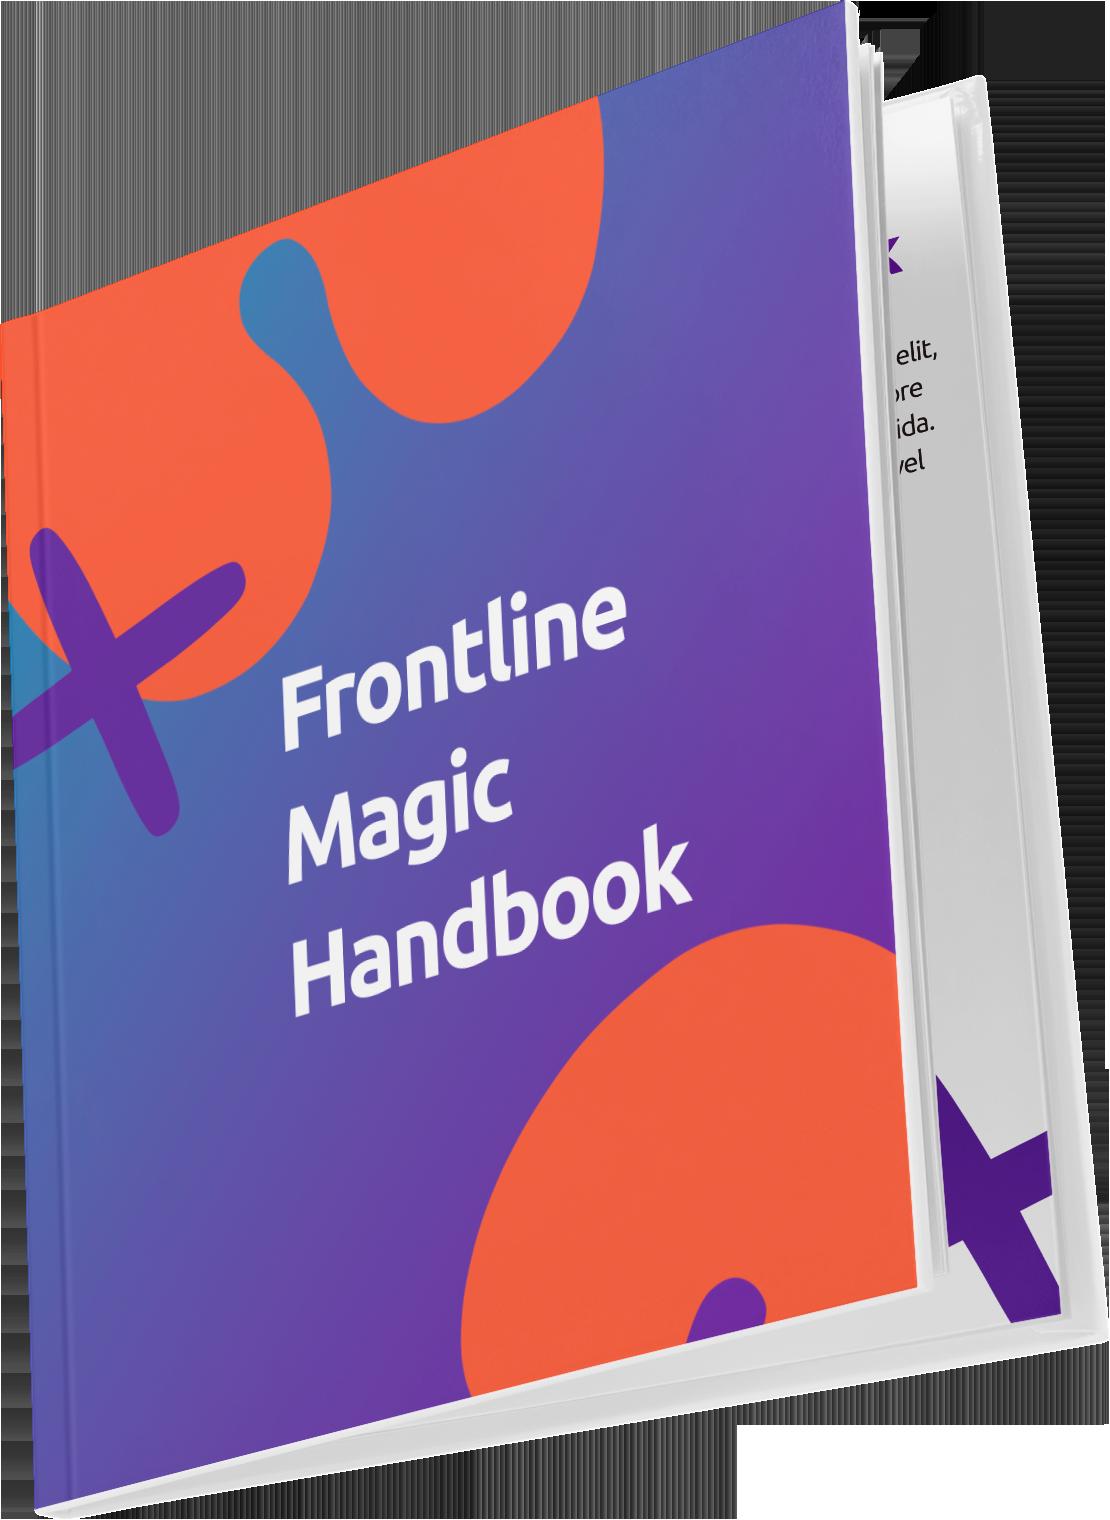 Frontline Magic Handbook Mockup Purple and Orange